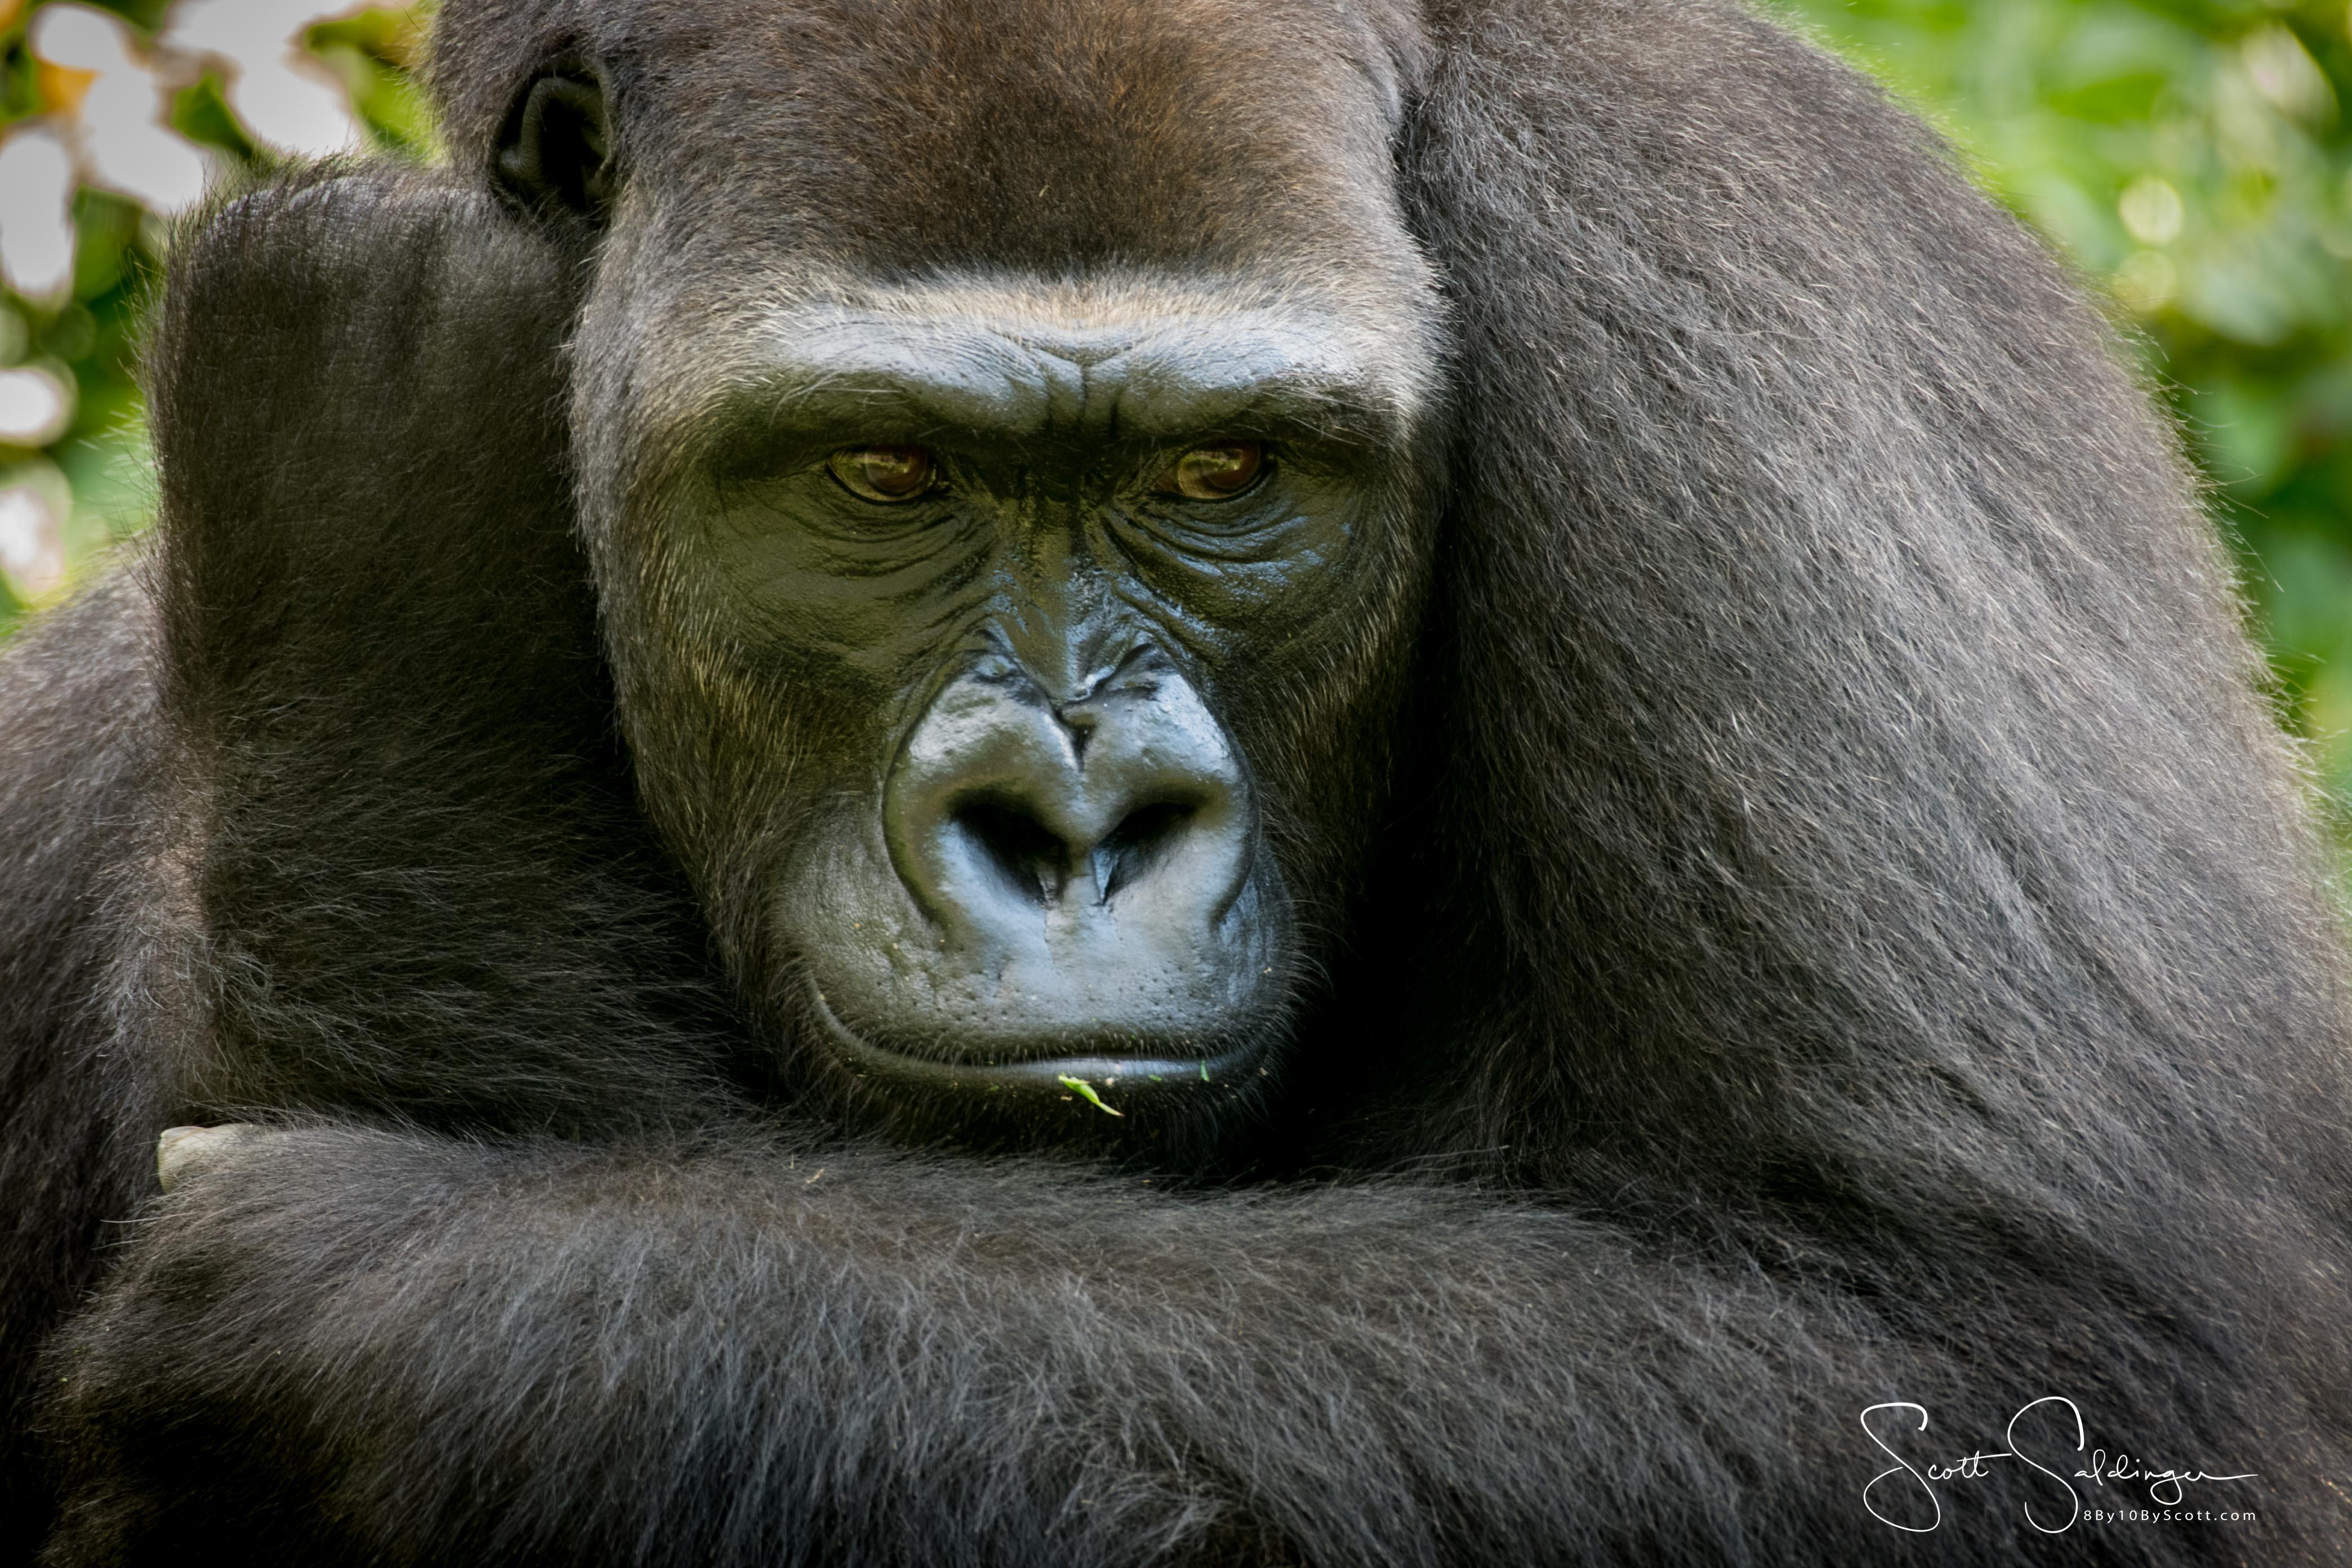 Apes-5653